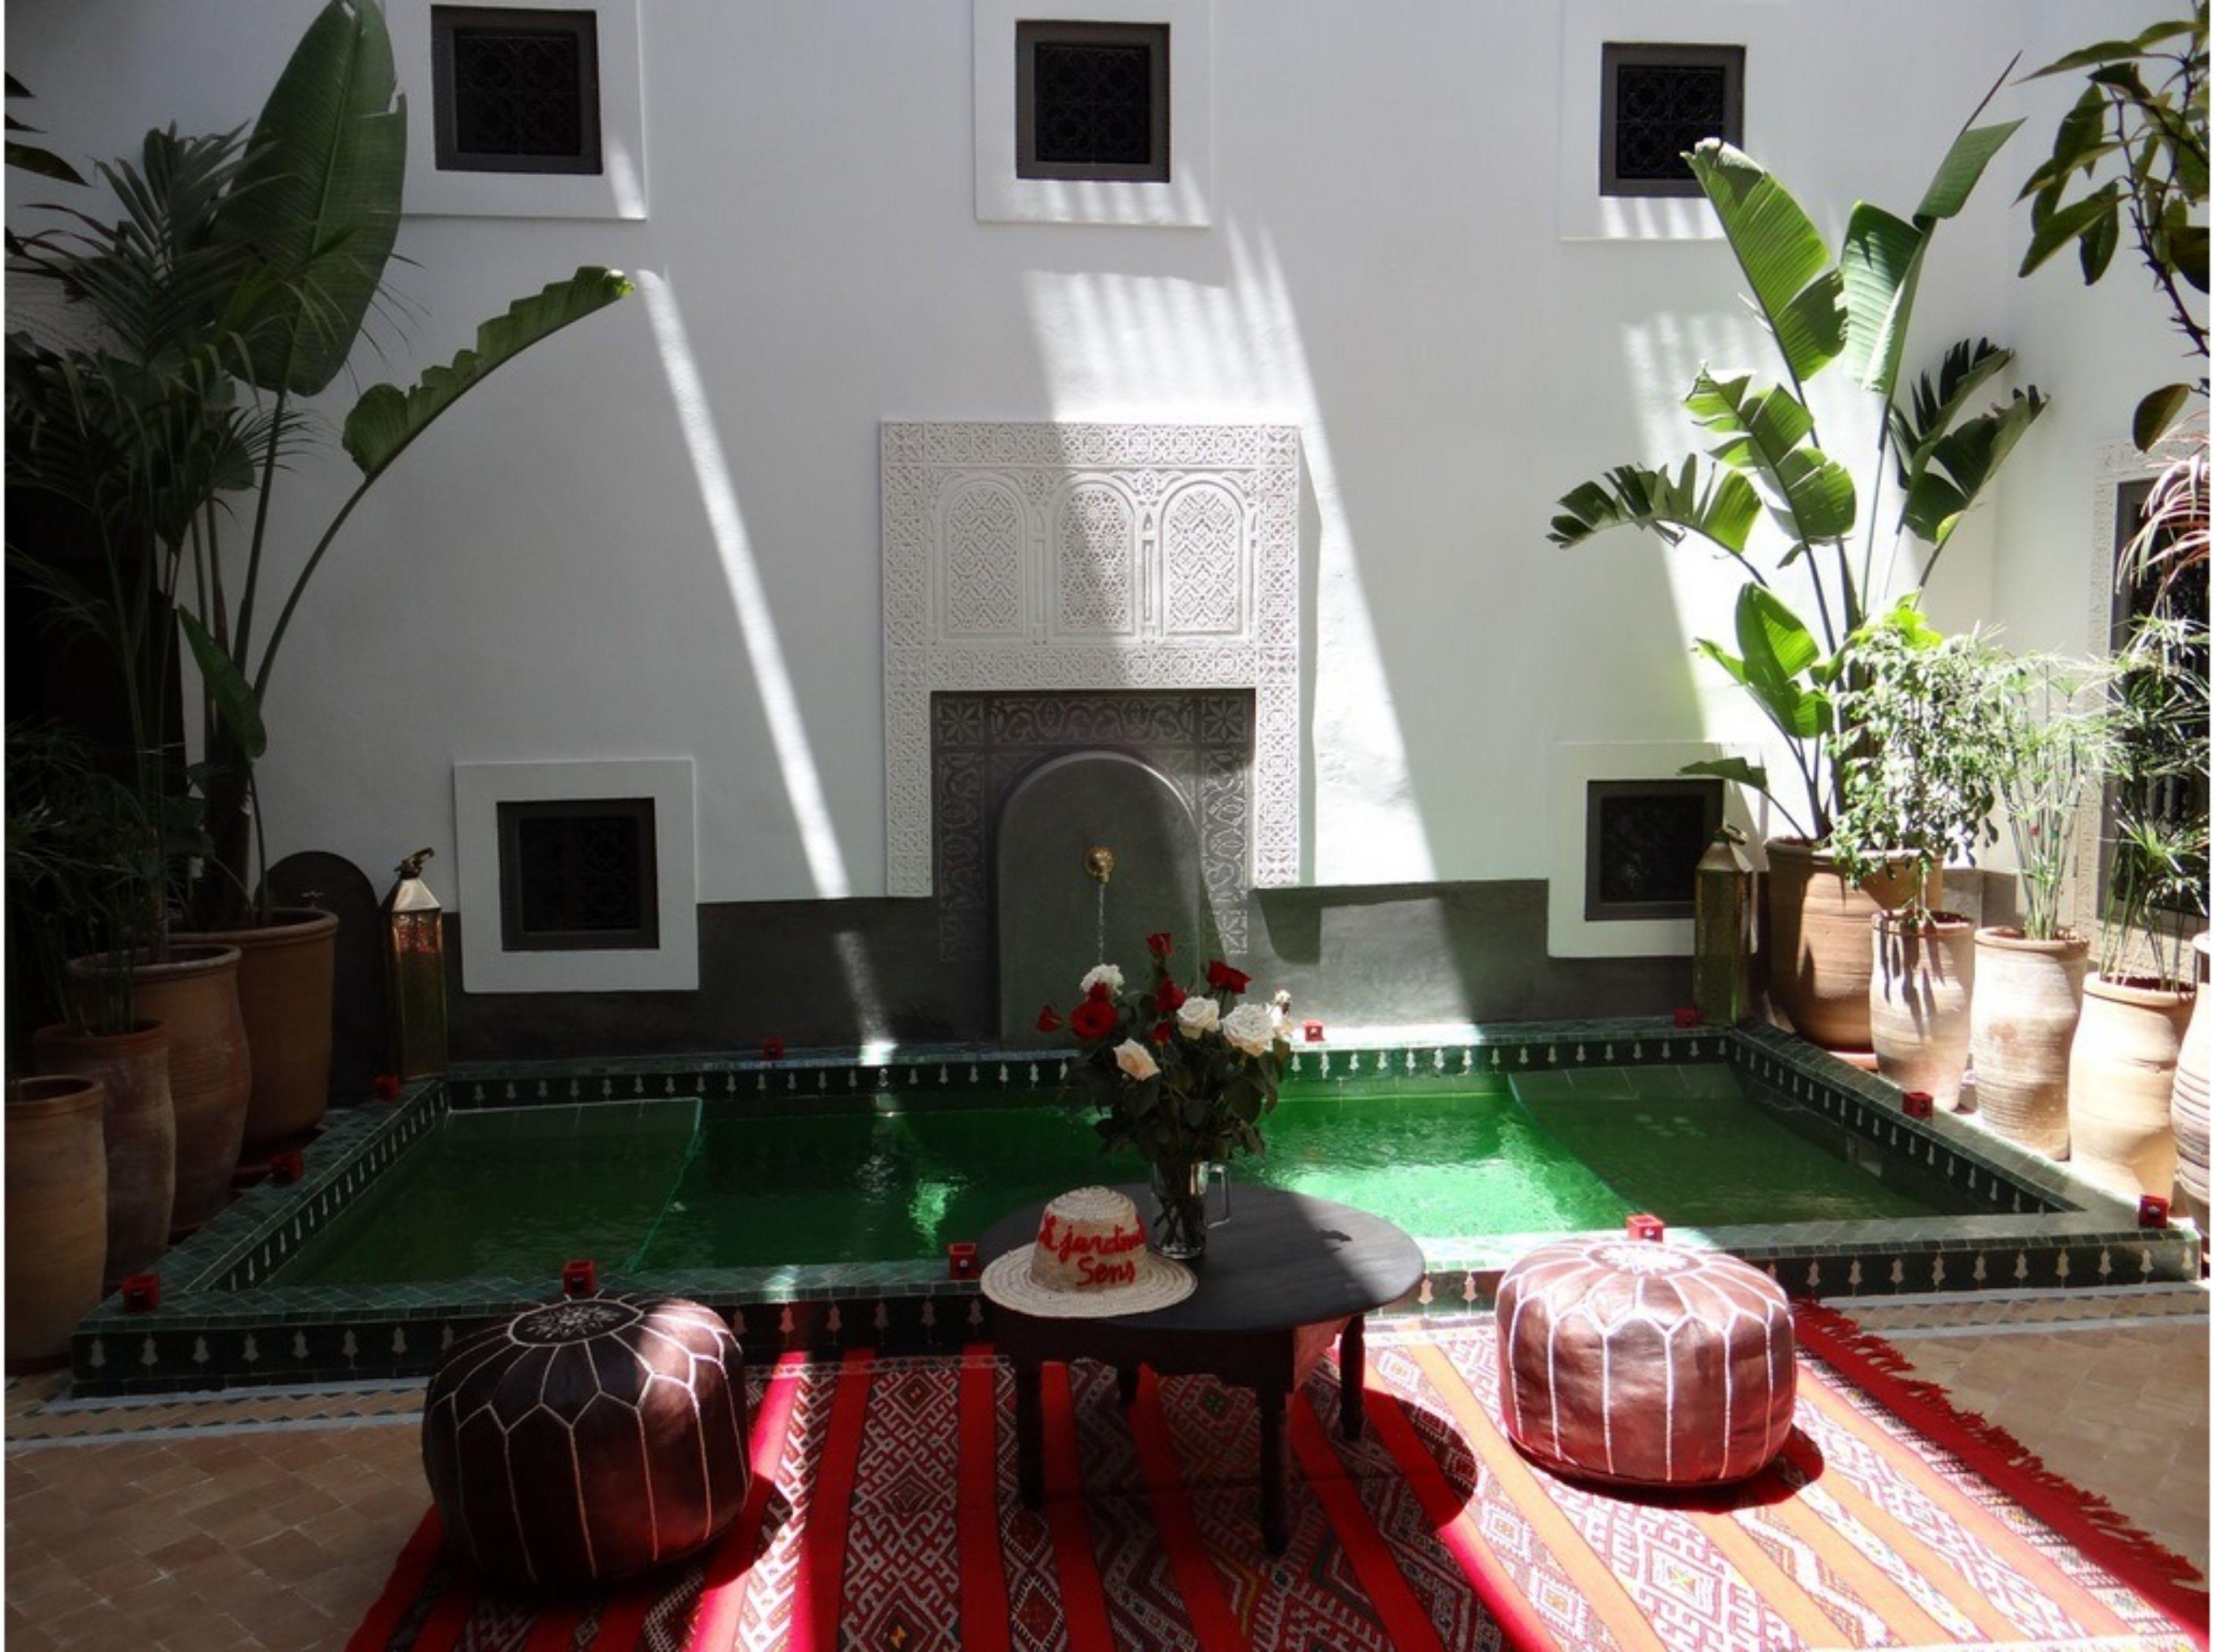 Riad Le Jardin Des Sens